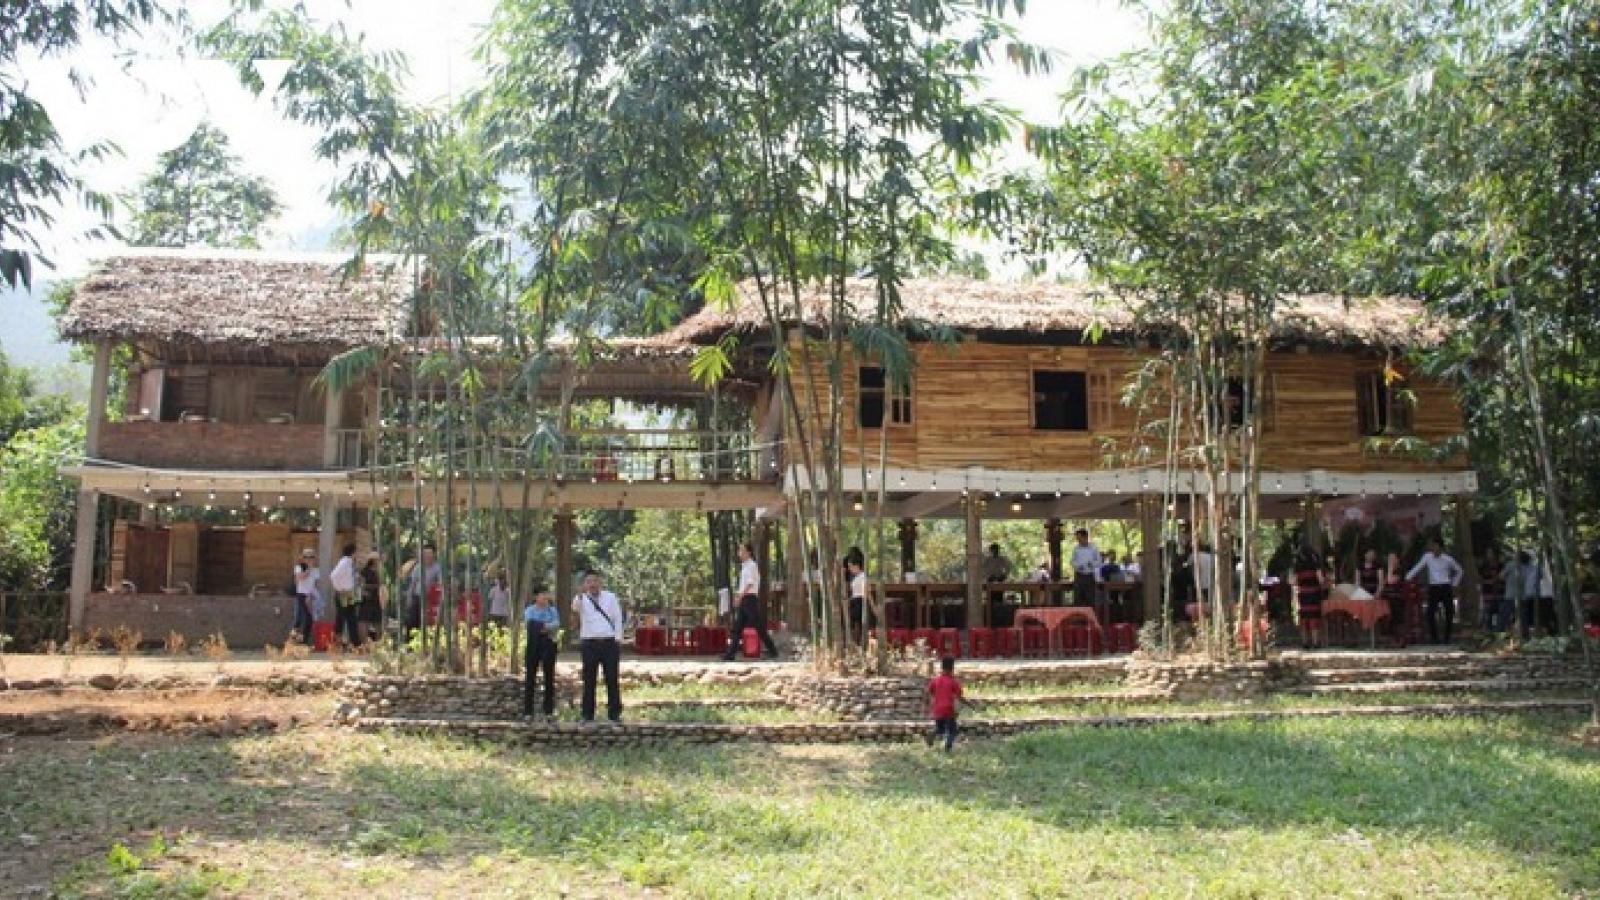 Co Tu's homestay service develops community-based tourism